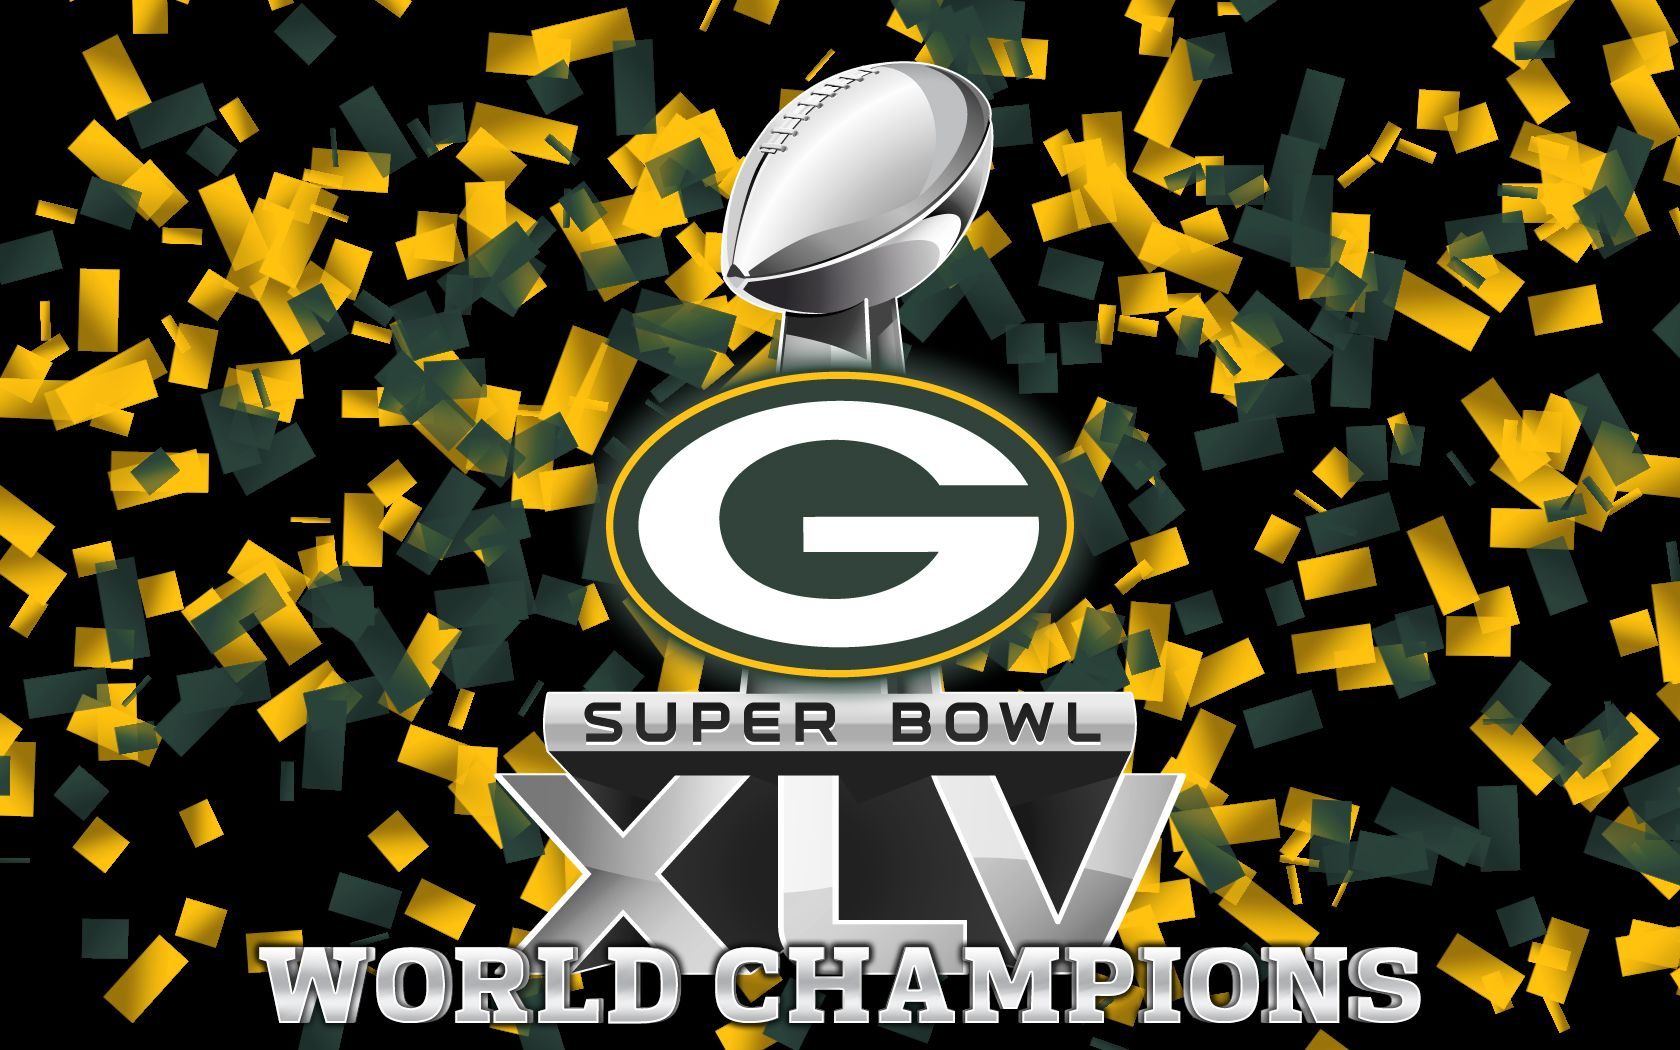 Super Bowl Halftime Show History